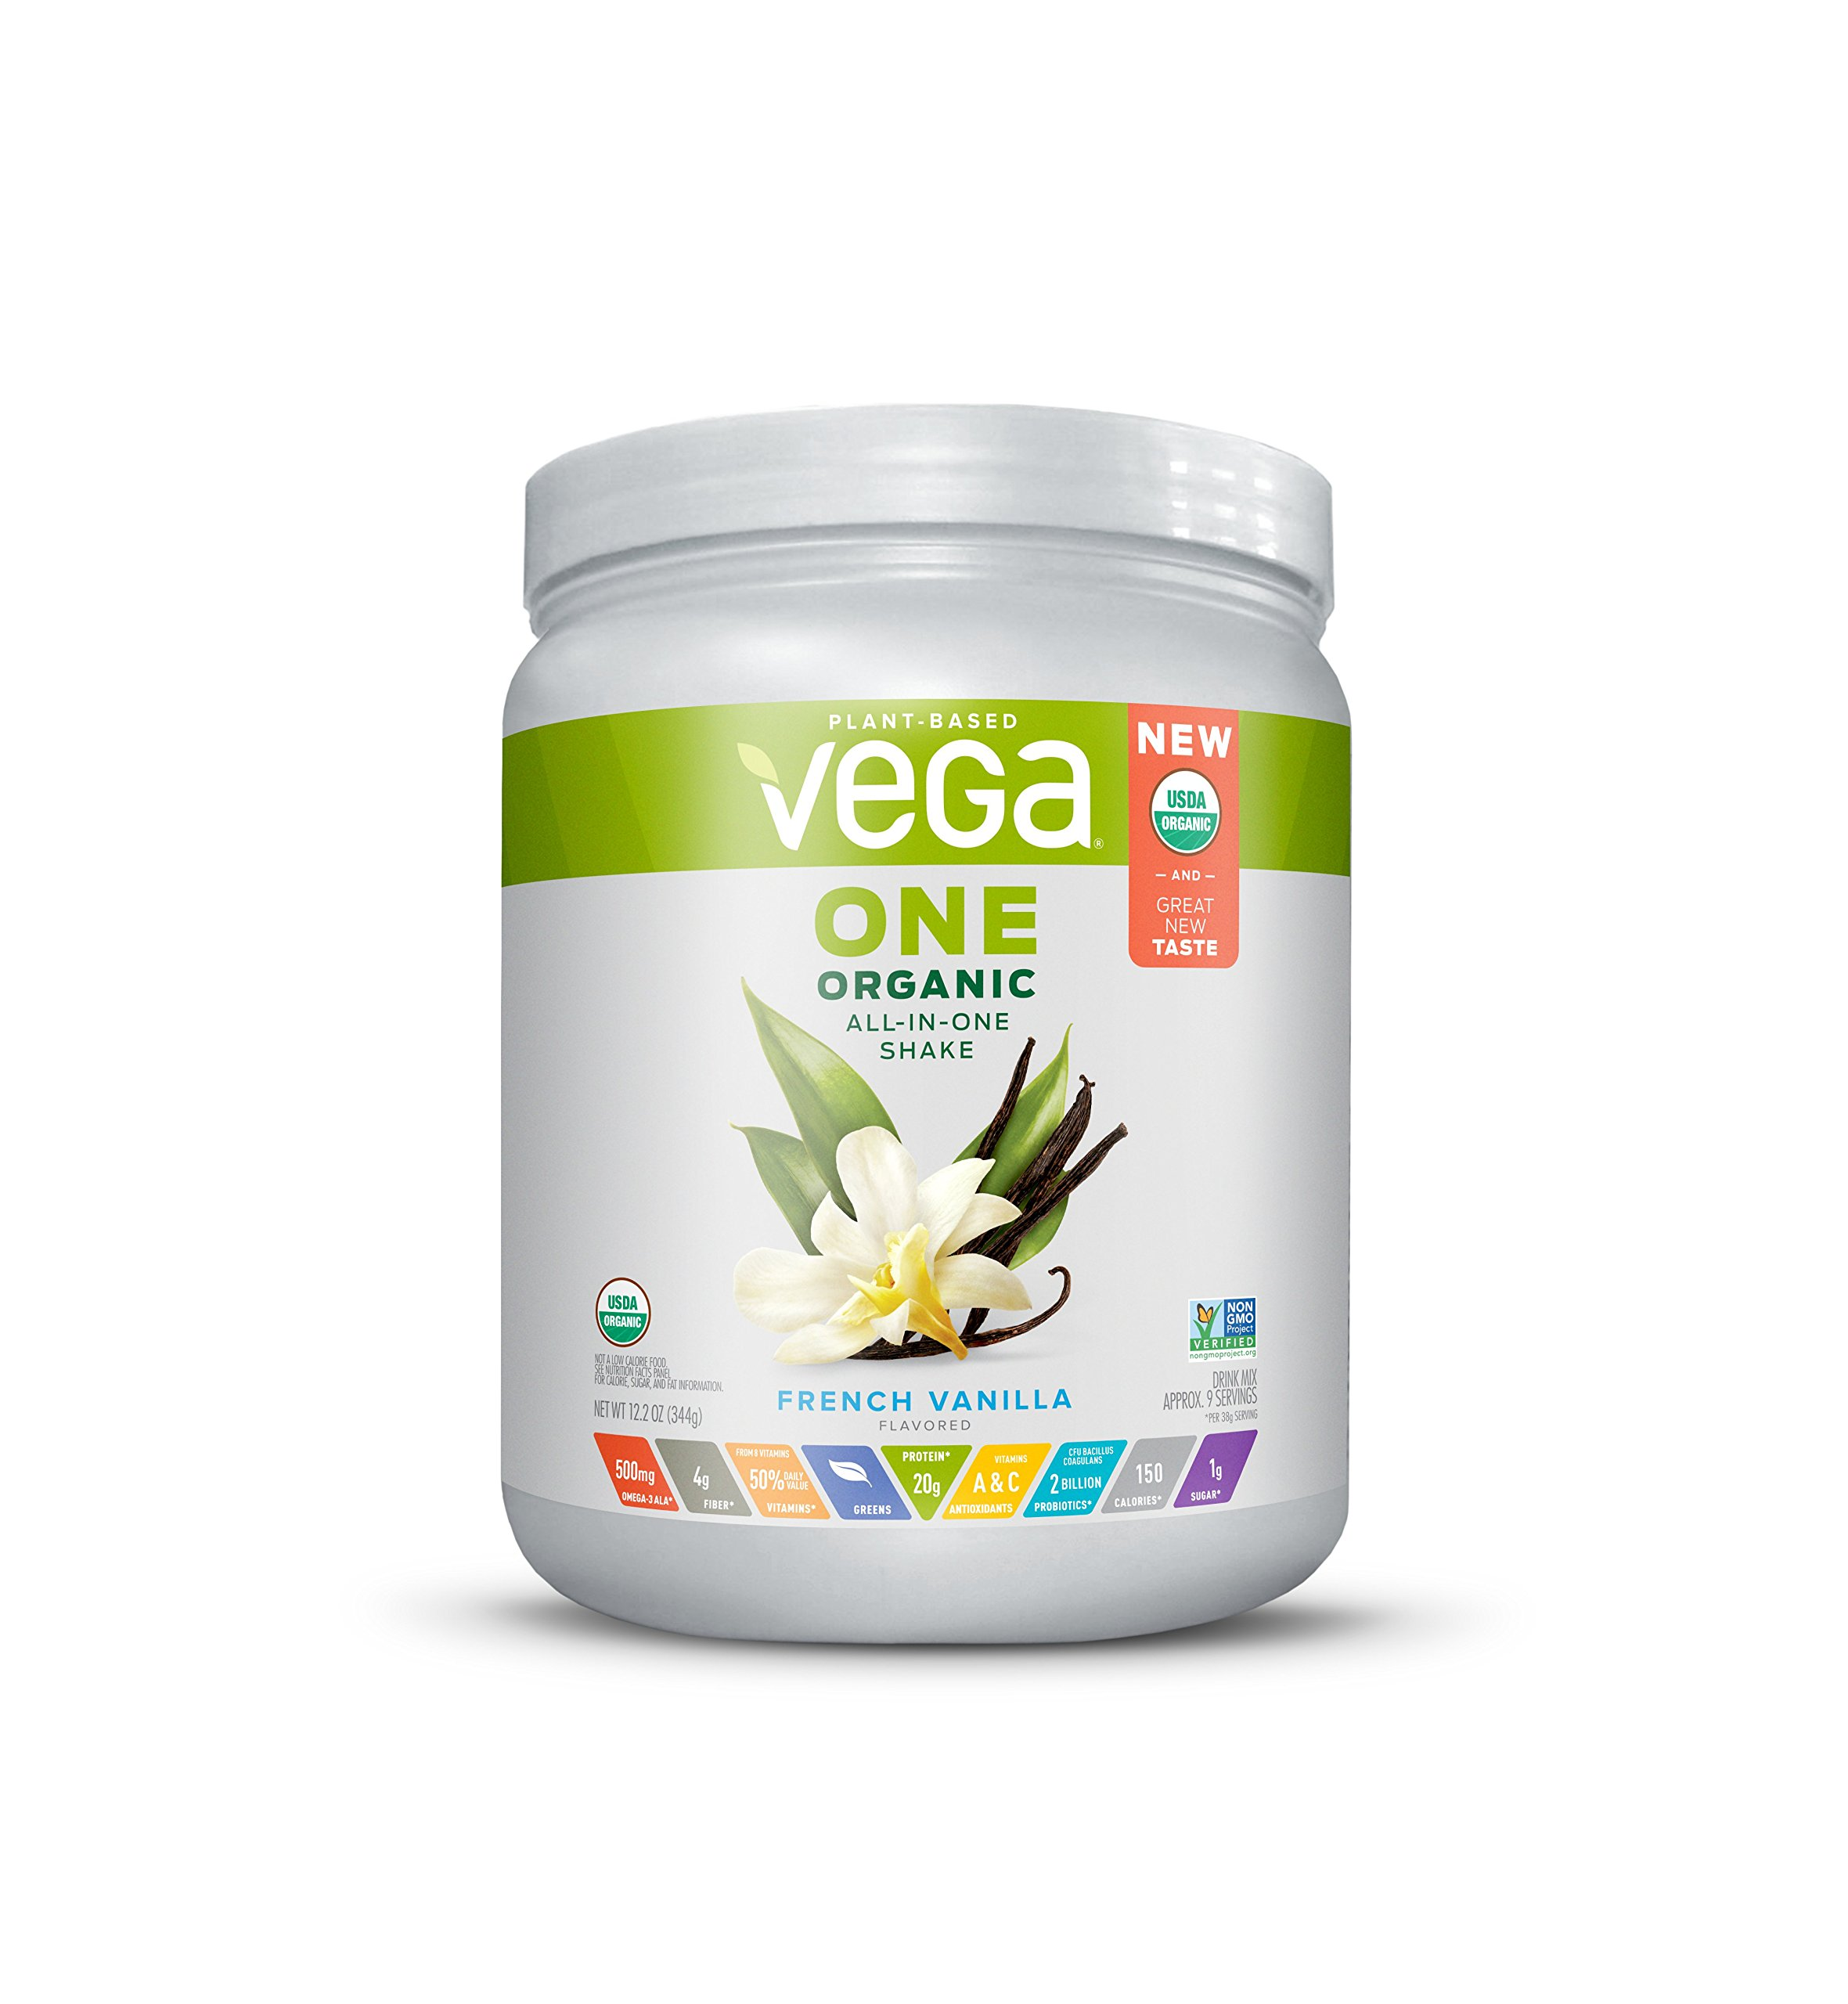 Vega One Organic Plant Protein Powder French Vanilla 12.2 Ounce - Plant Based Vegan Protein Powder, Non Dairy, Gluten Free, Non GMO by VEGA